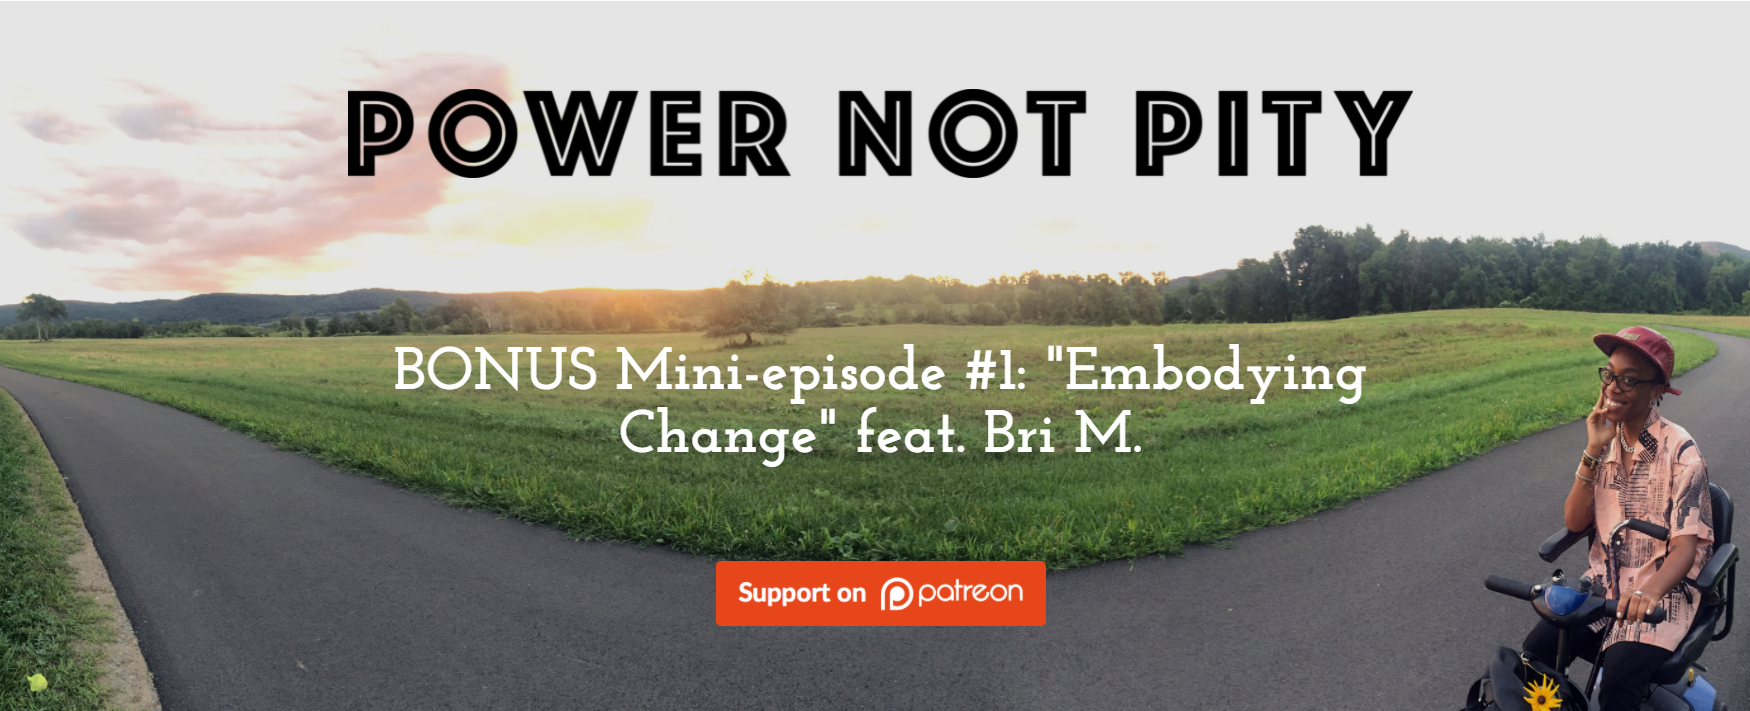 Power not Pity website screenshot that reads Power Not Pity, BONUS Mini-episode #1 'Embodying Change' feat. Bri M.